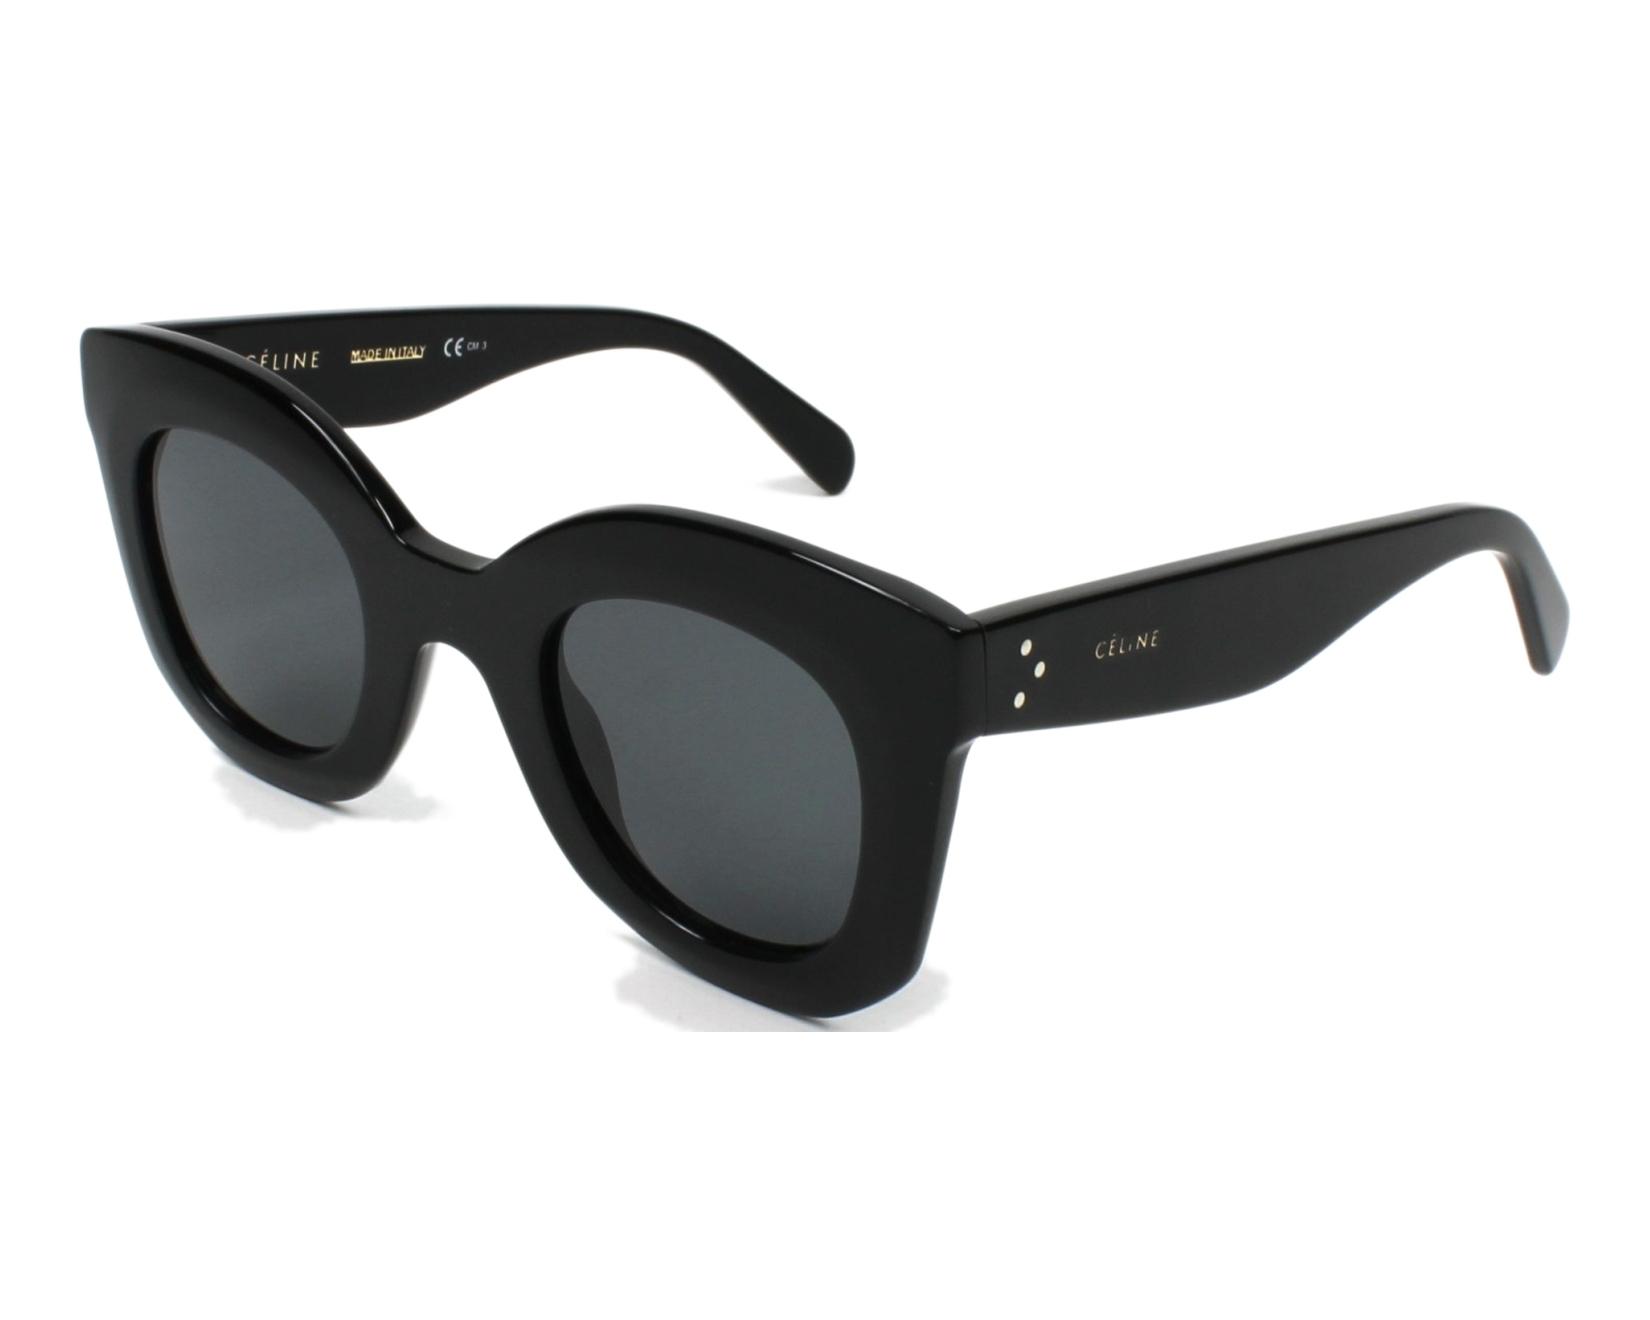 d59e3fa37d80 Céline Sunglasses CL-41393-S 807 BN Black - Visionet Celine Baby Marta  Sunglasses ...